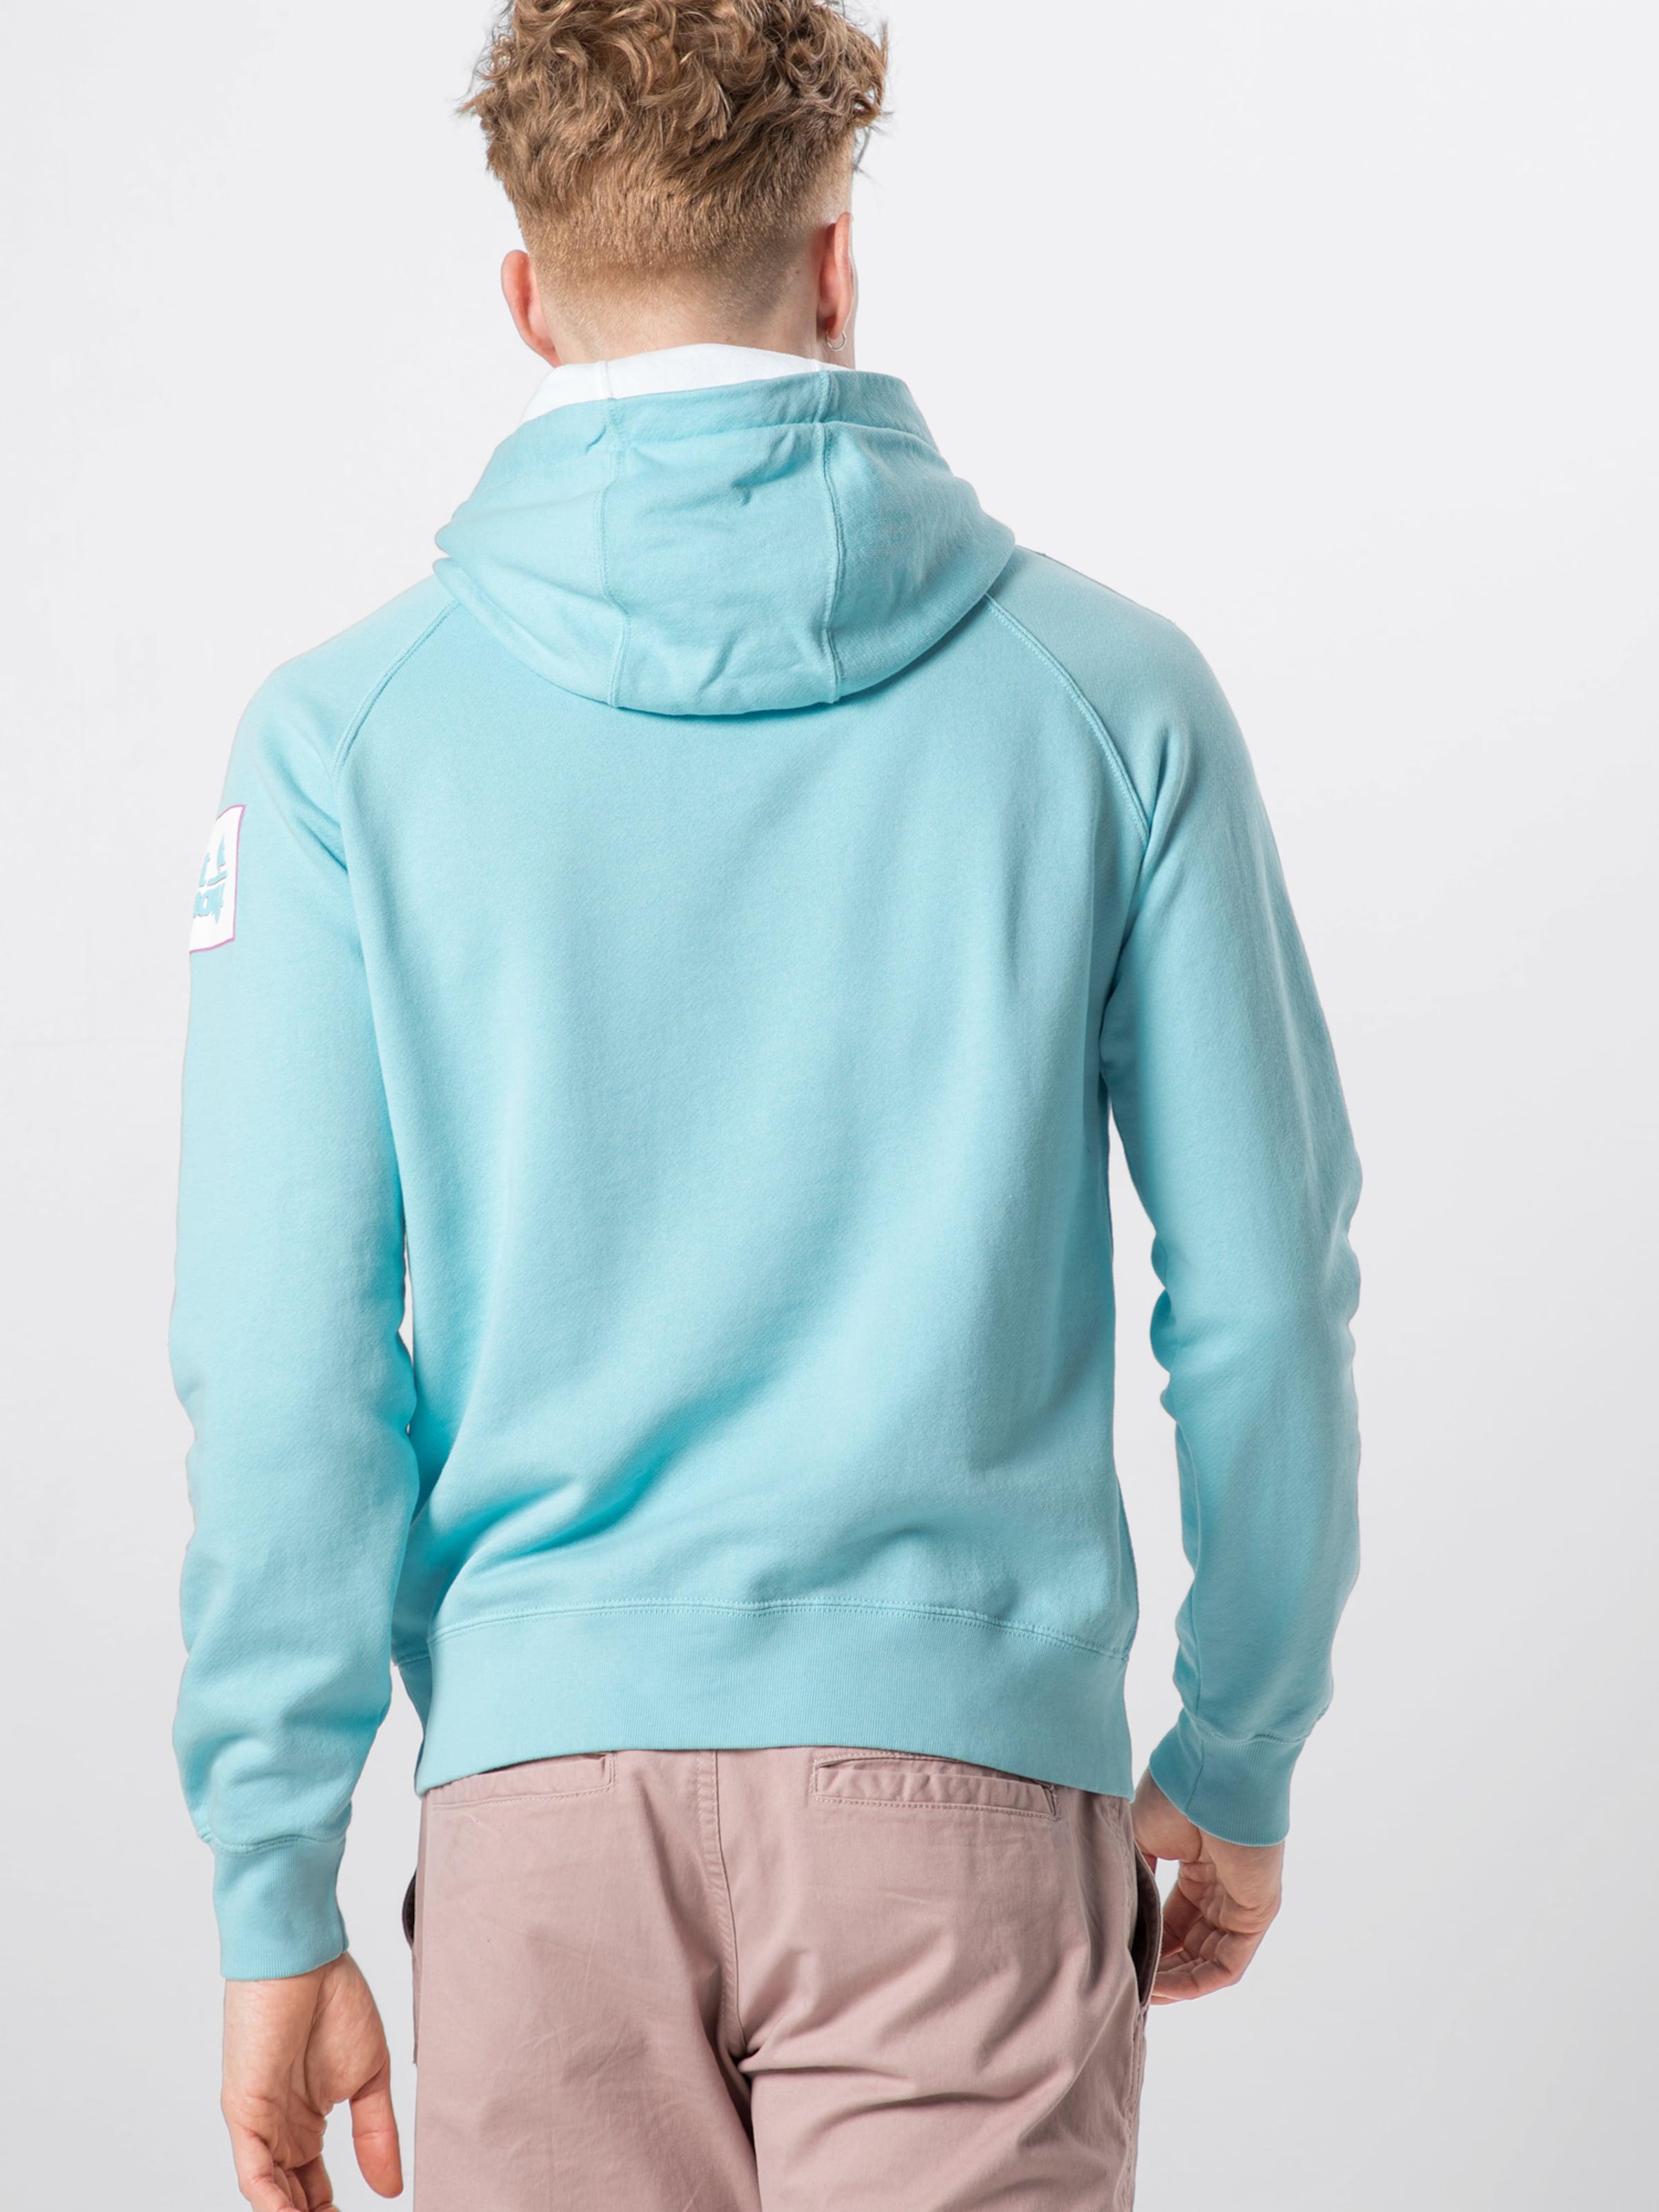 Best Company Fleece' En Bleu 'hooded shirt Sweat 35q4LARj